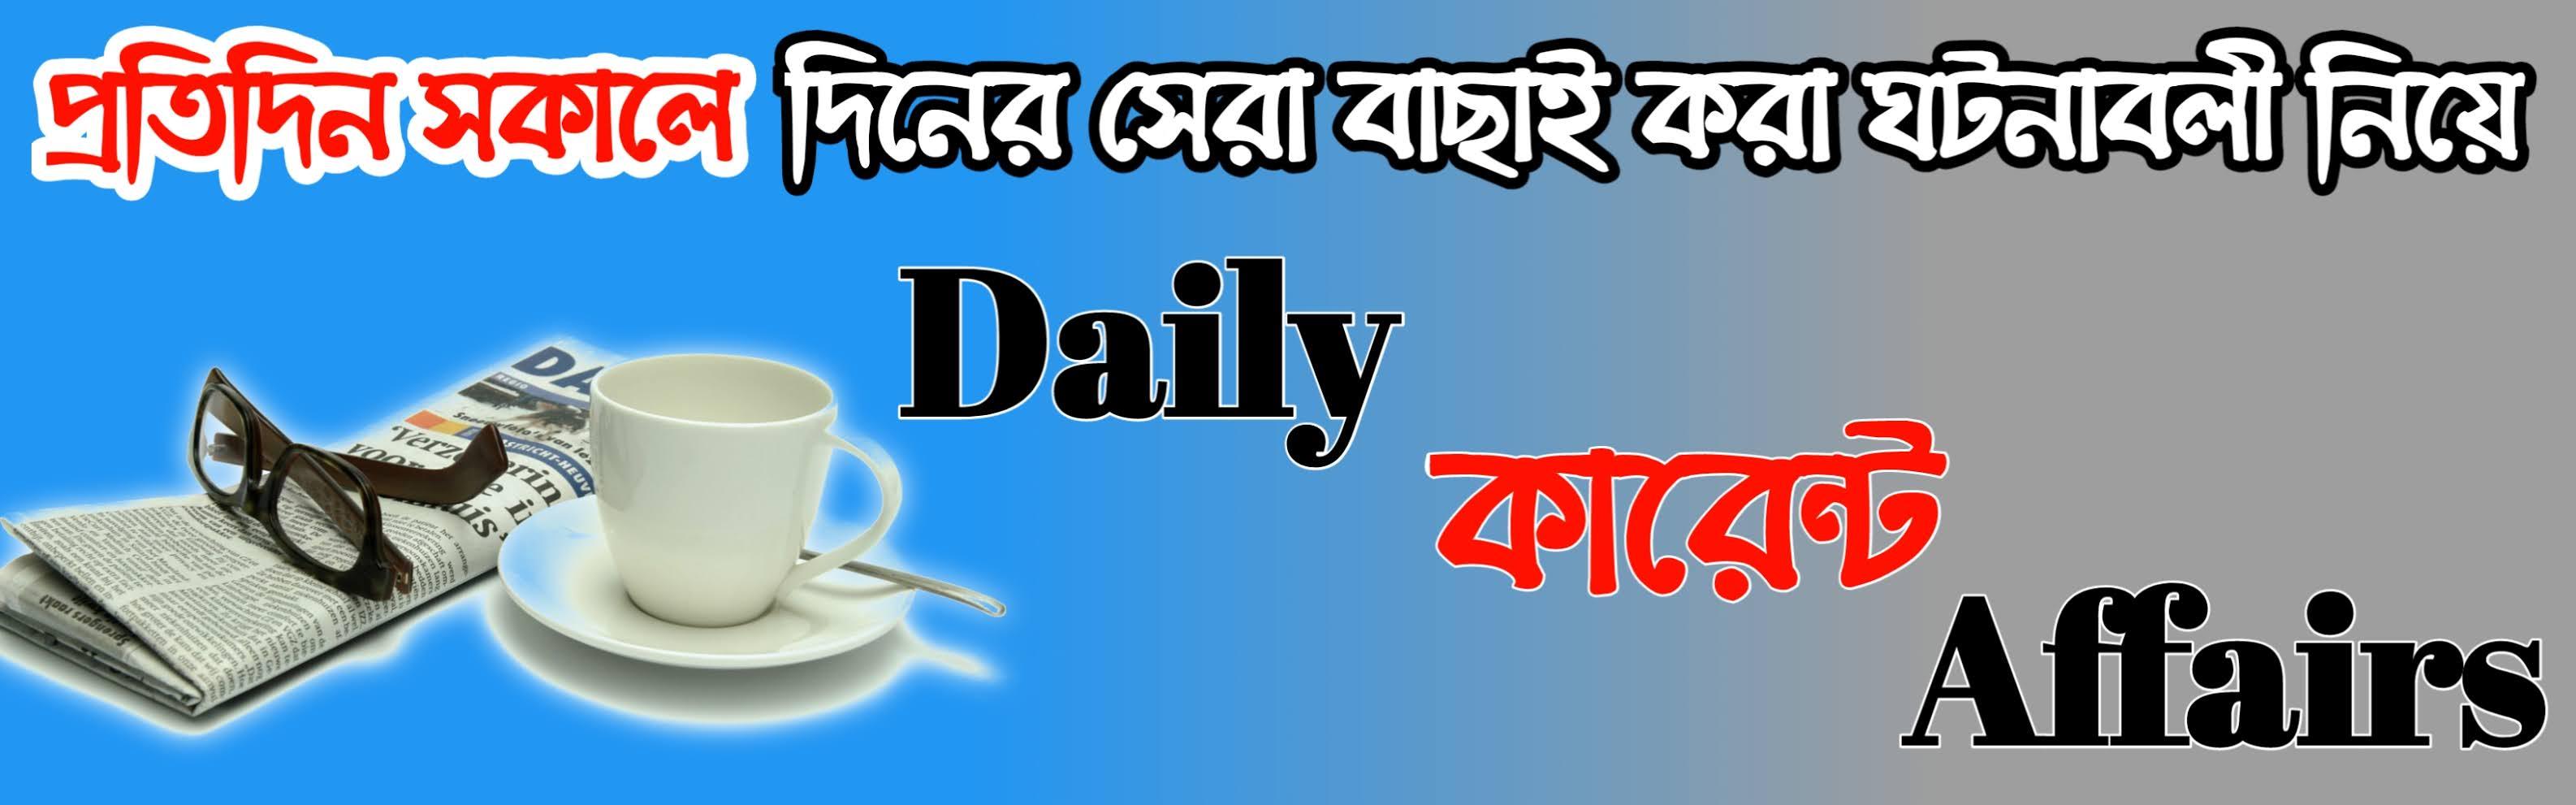 Daily Current Affairs in Bengali 2020 [Updated]- বাংলায় কারেন্ট অ্যাফেয়ার 2020